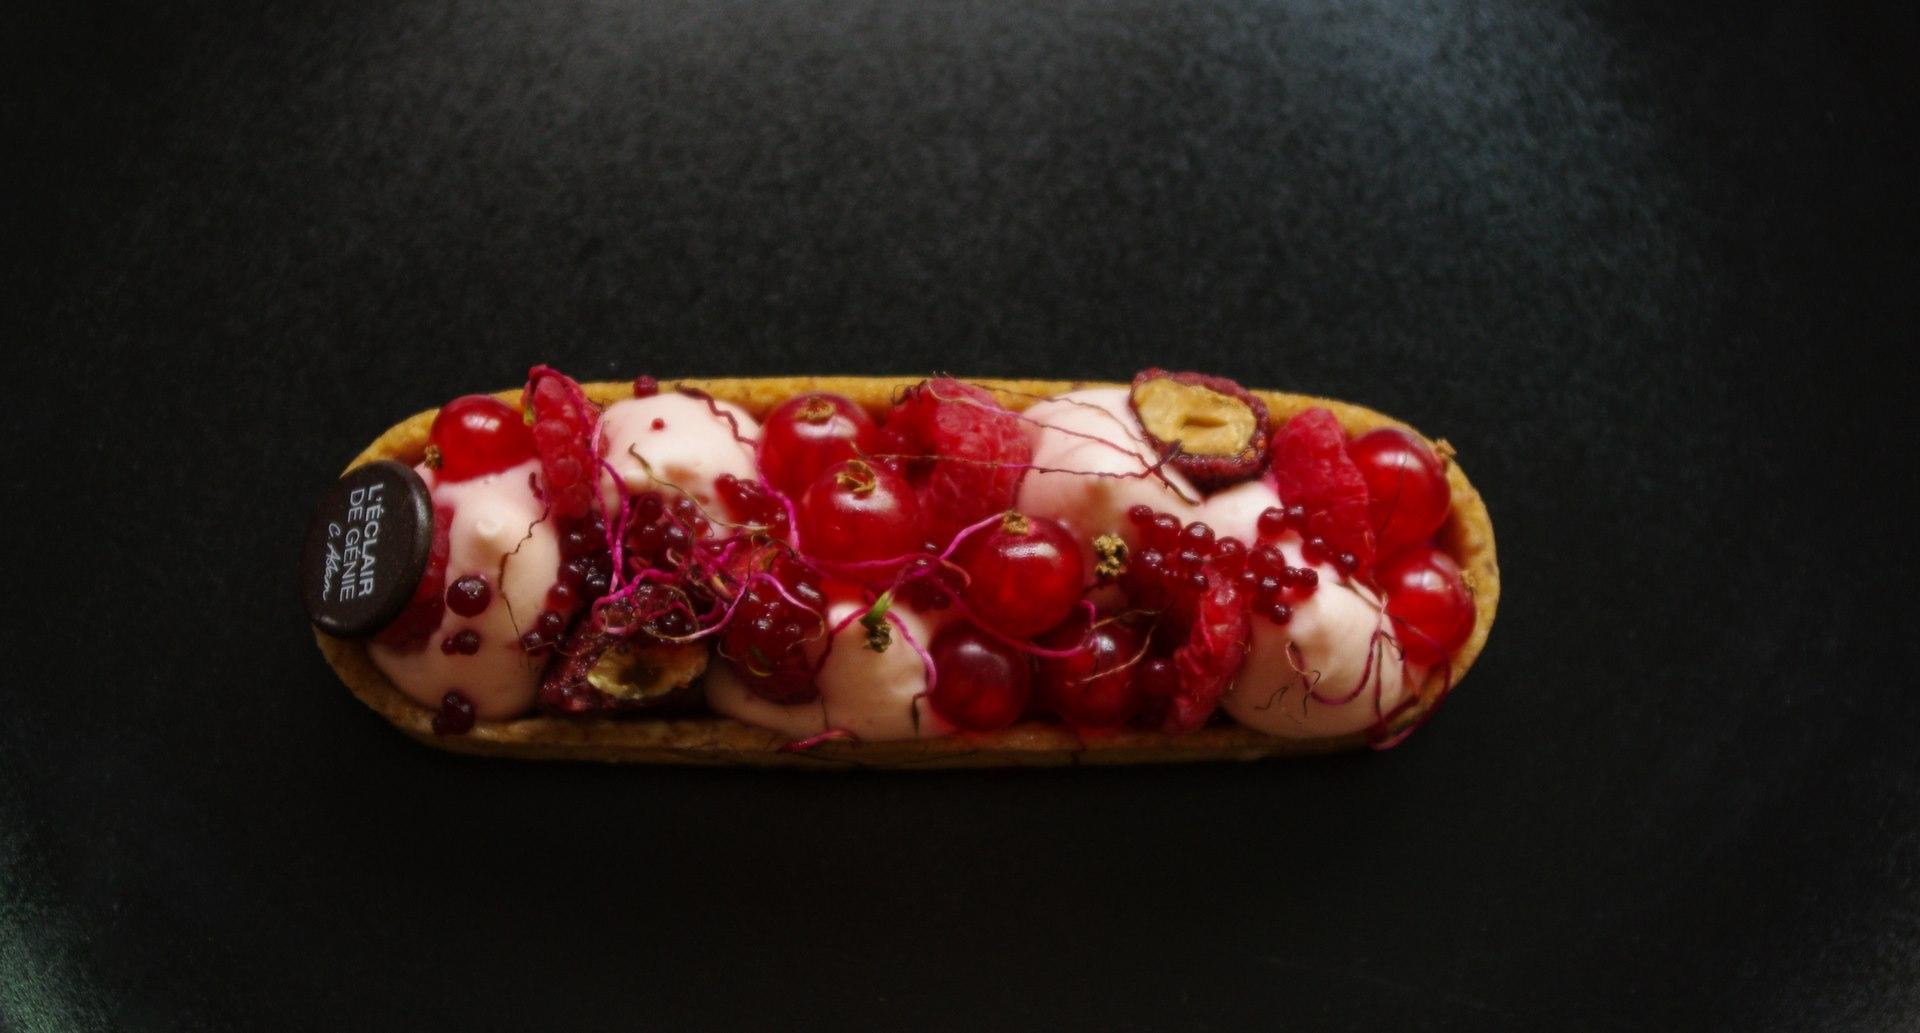 barlette-3-framboise-fleur-oranger-eclair-de-genie  (2)-cestmoilechef